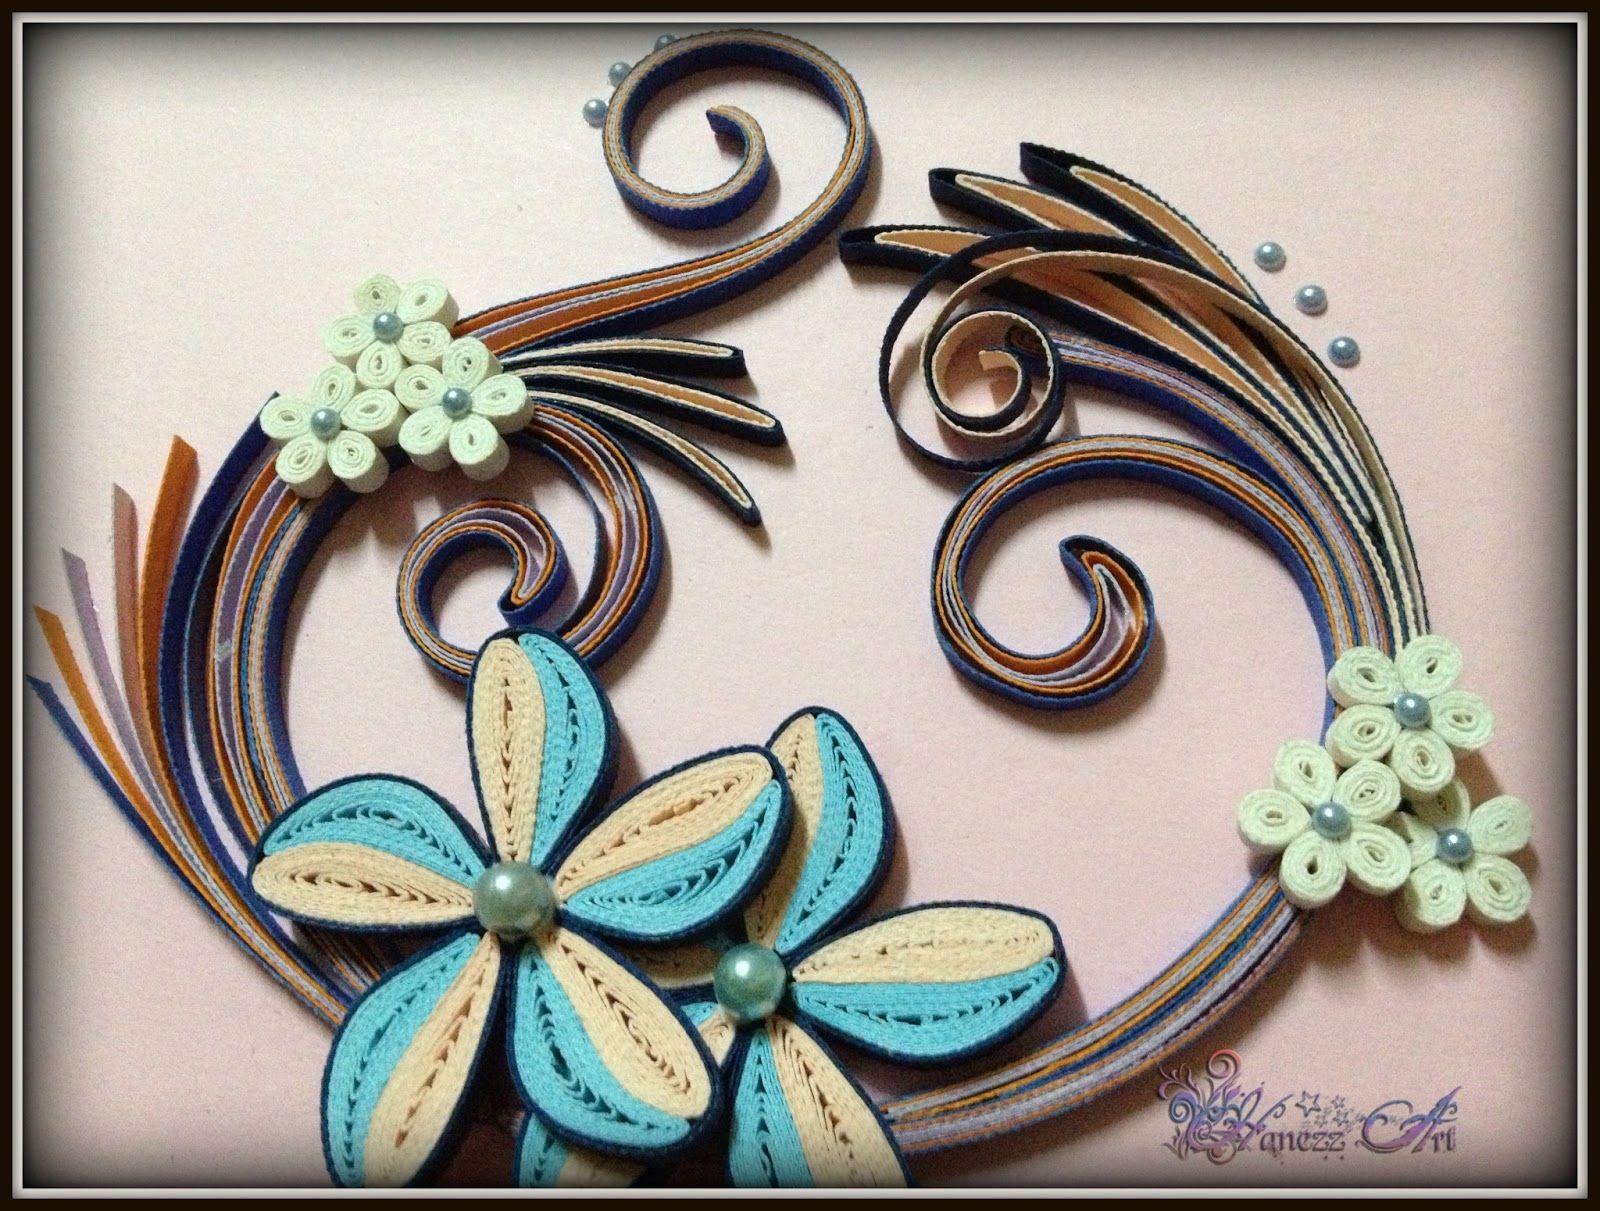 Hanezz Art: Board: Make a wish